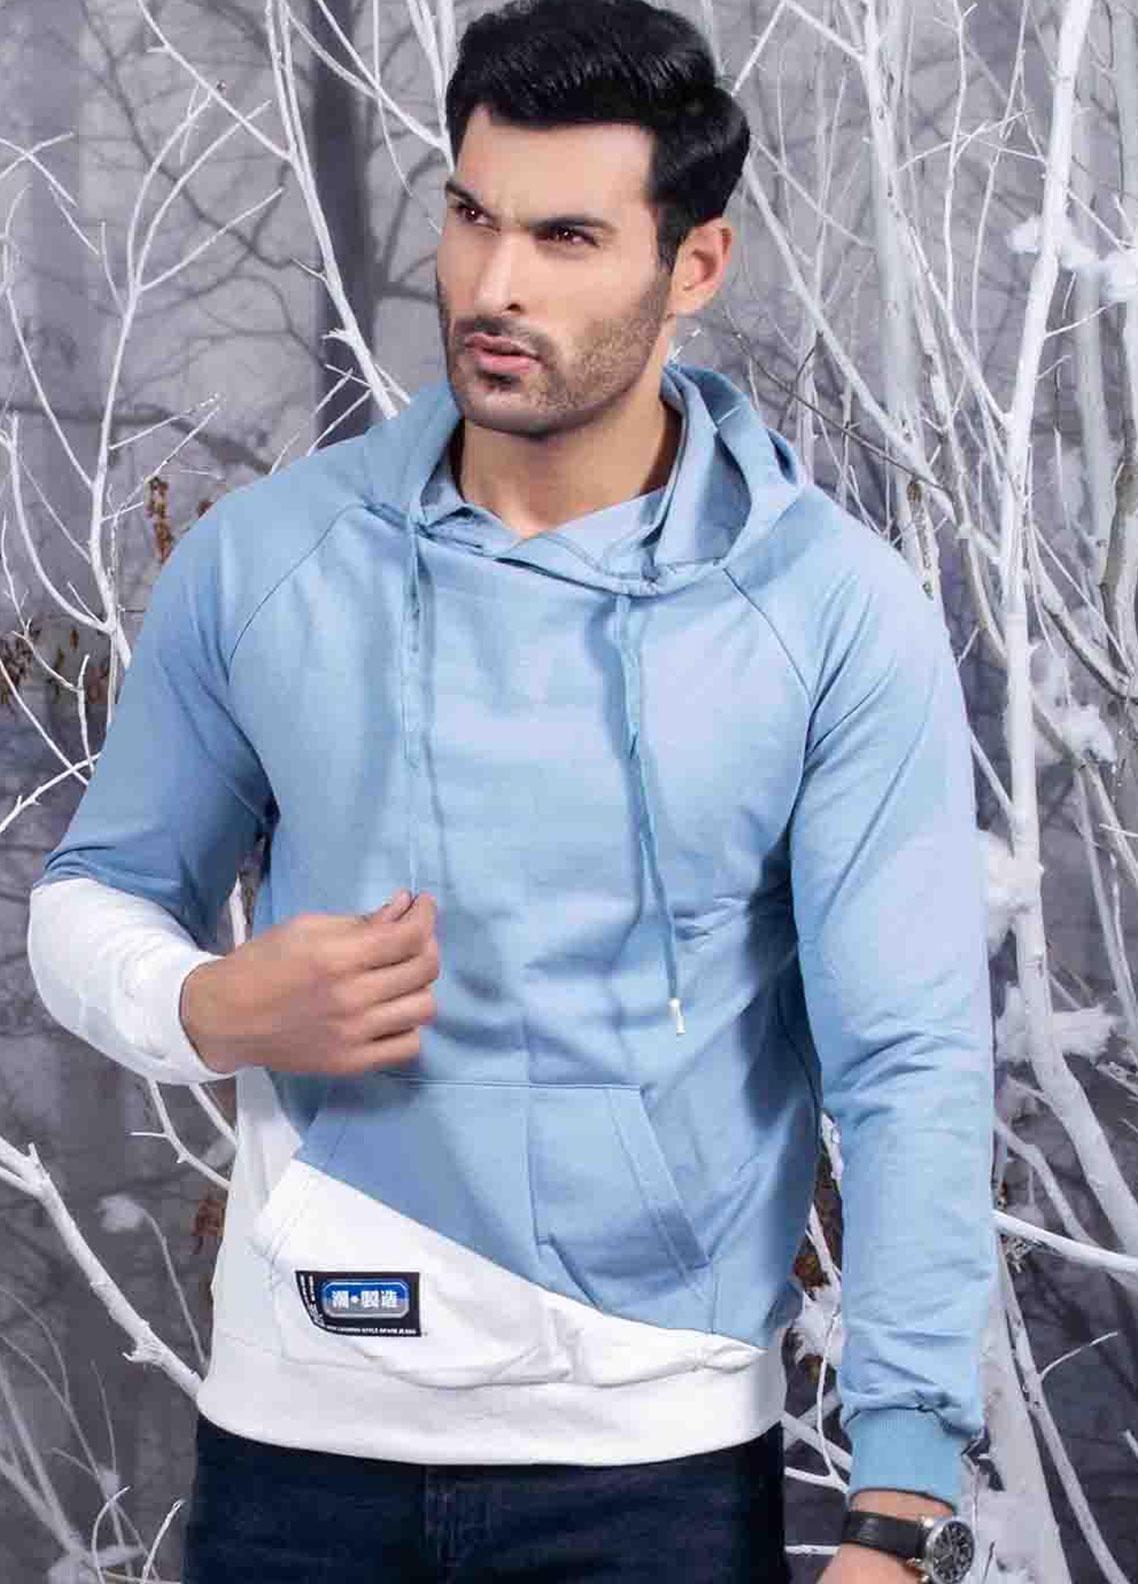 Ignite Wardrobe Cotton Drawstring Color Hoodies for Men -  IG20HDM 001